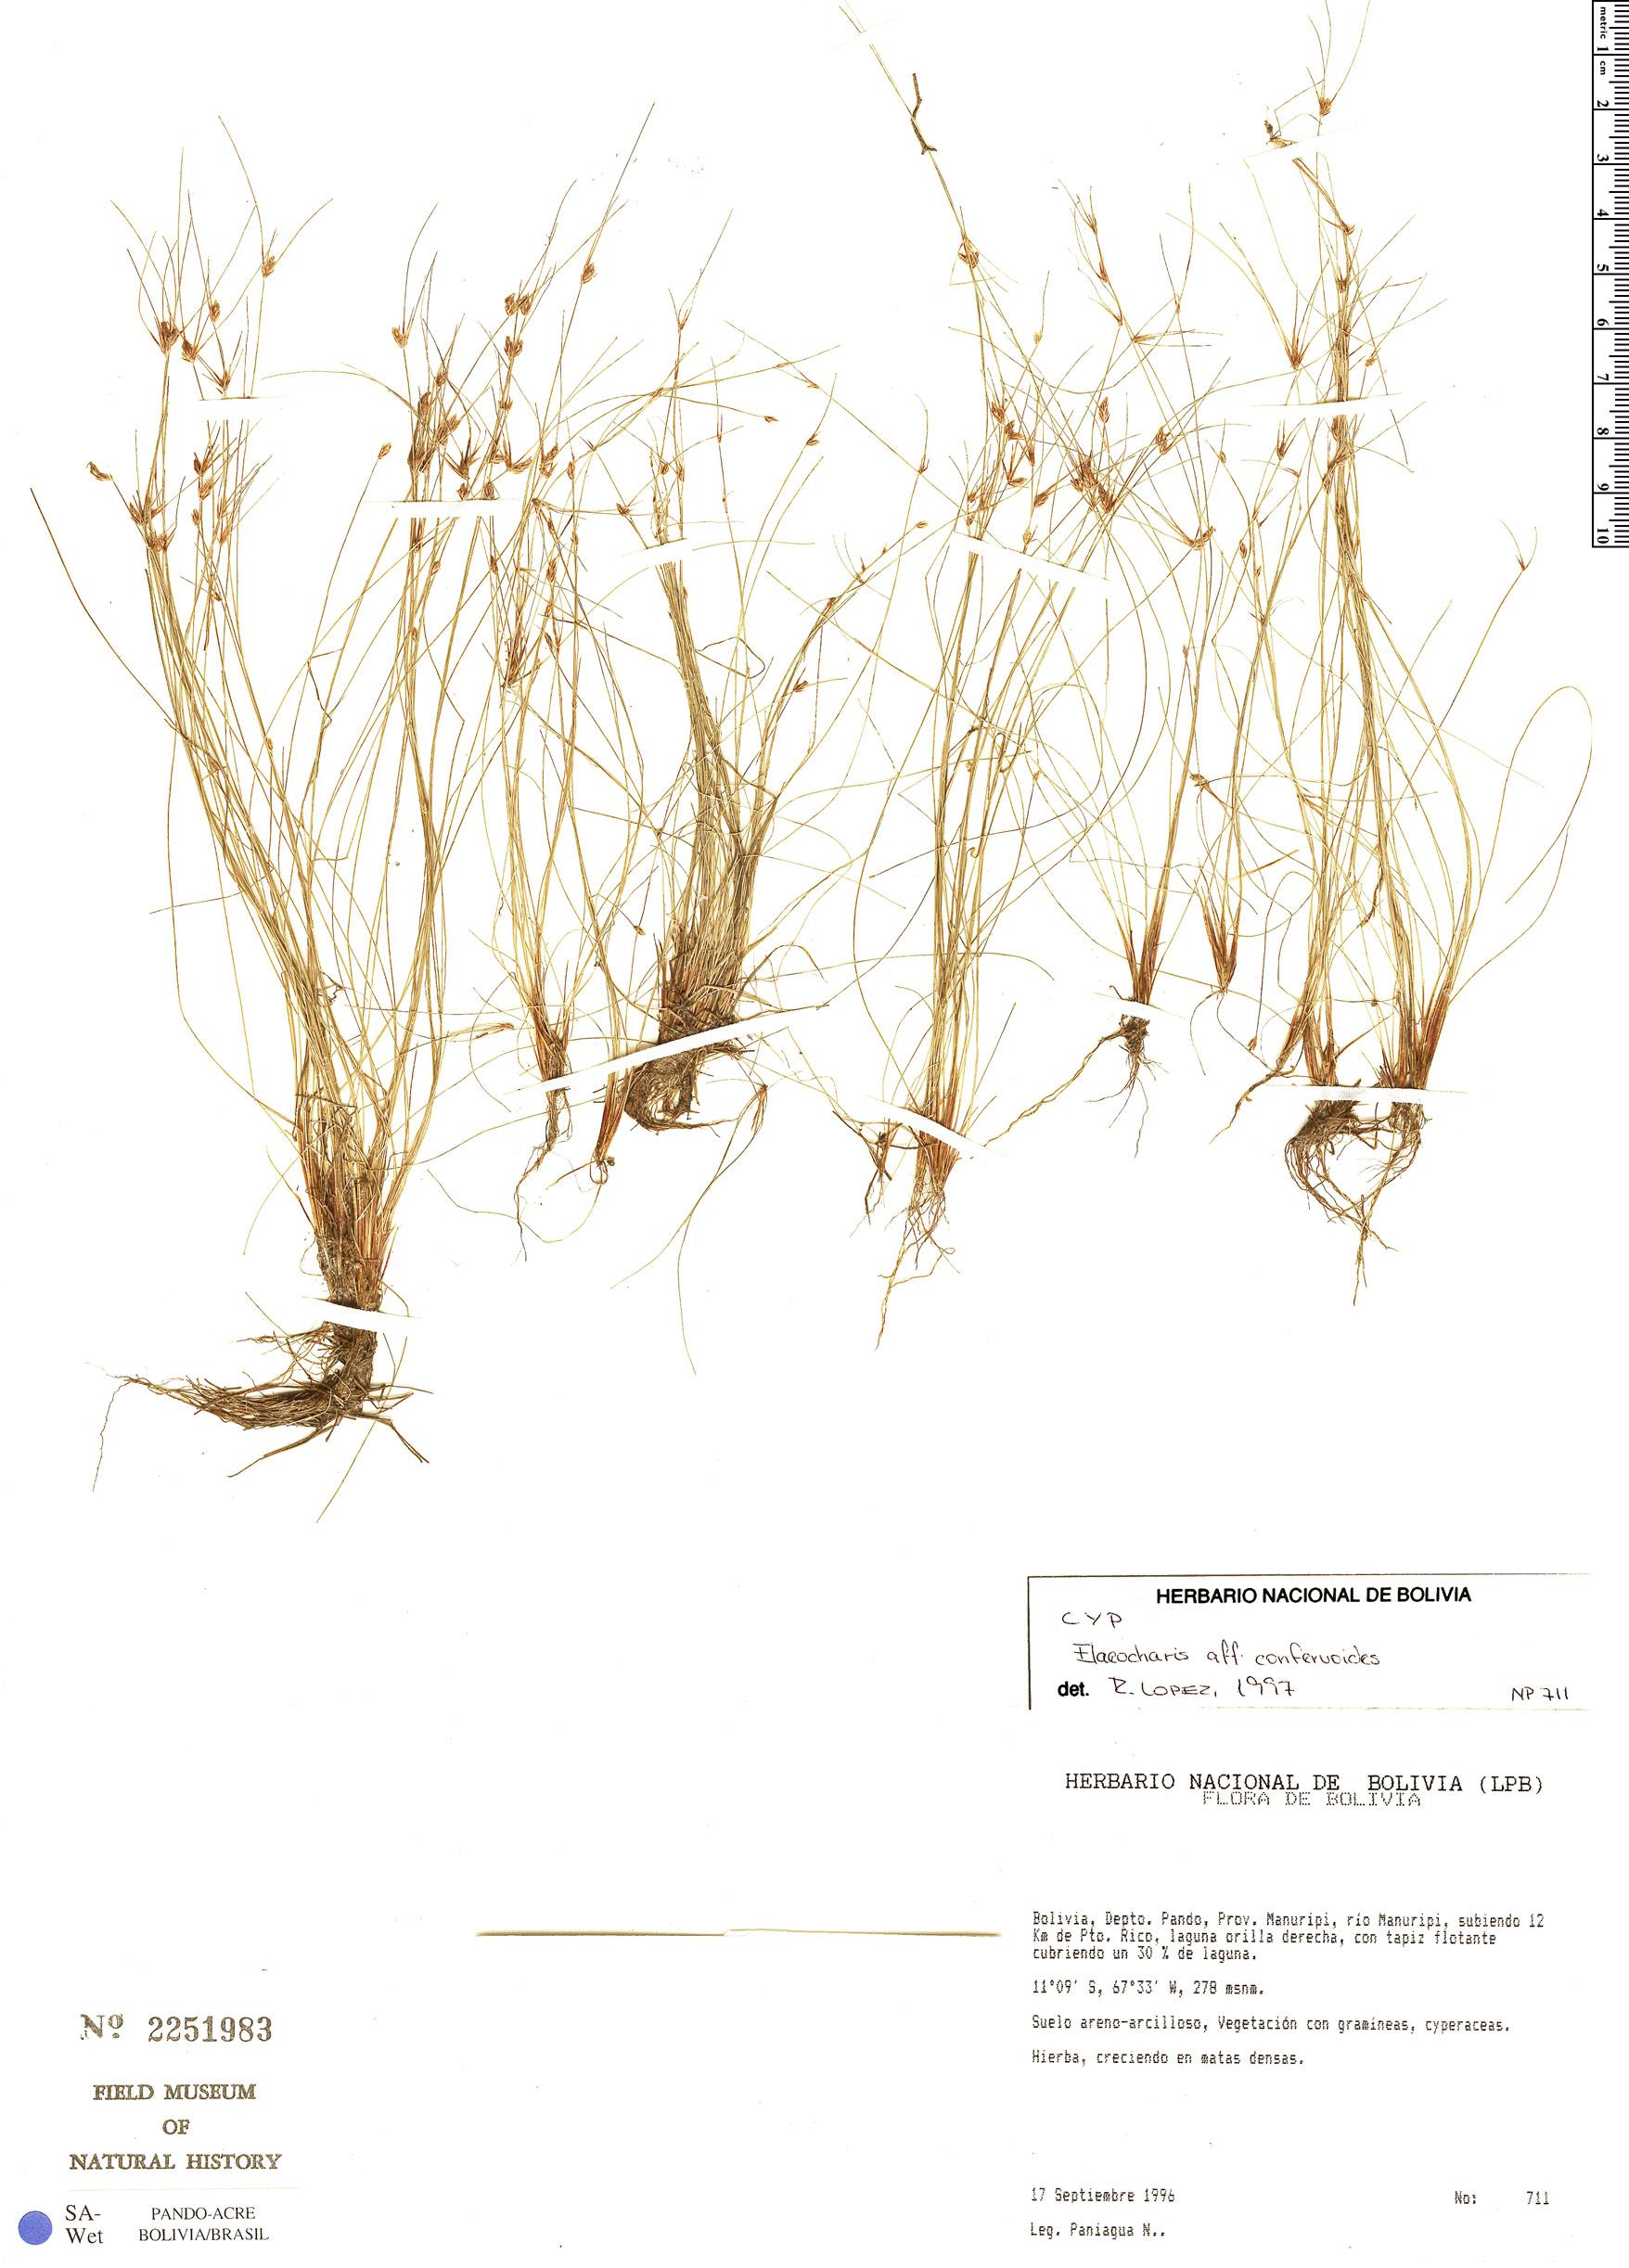 Specimen: Eleocharis confervoides